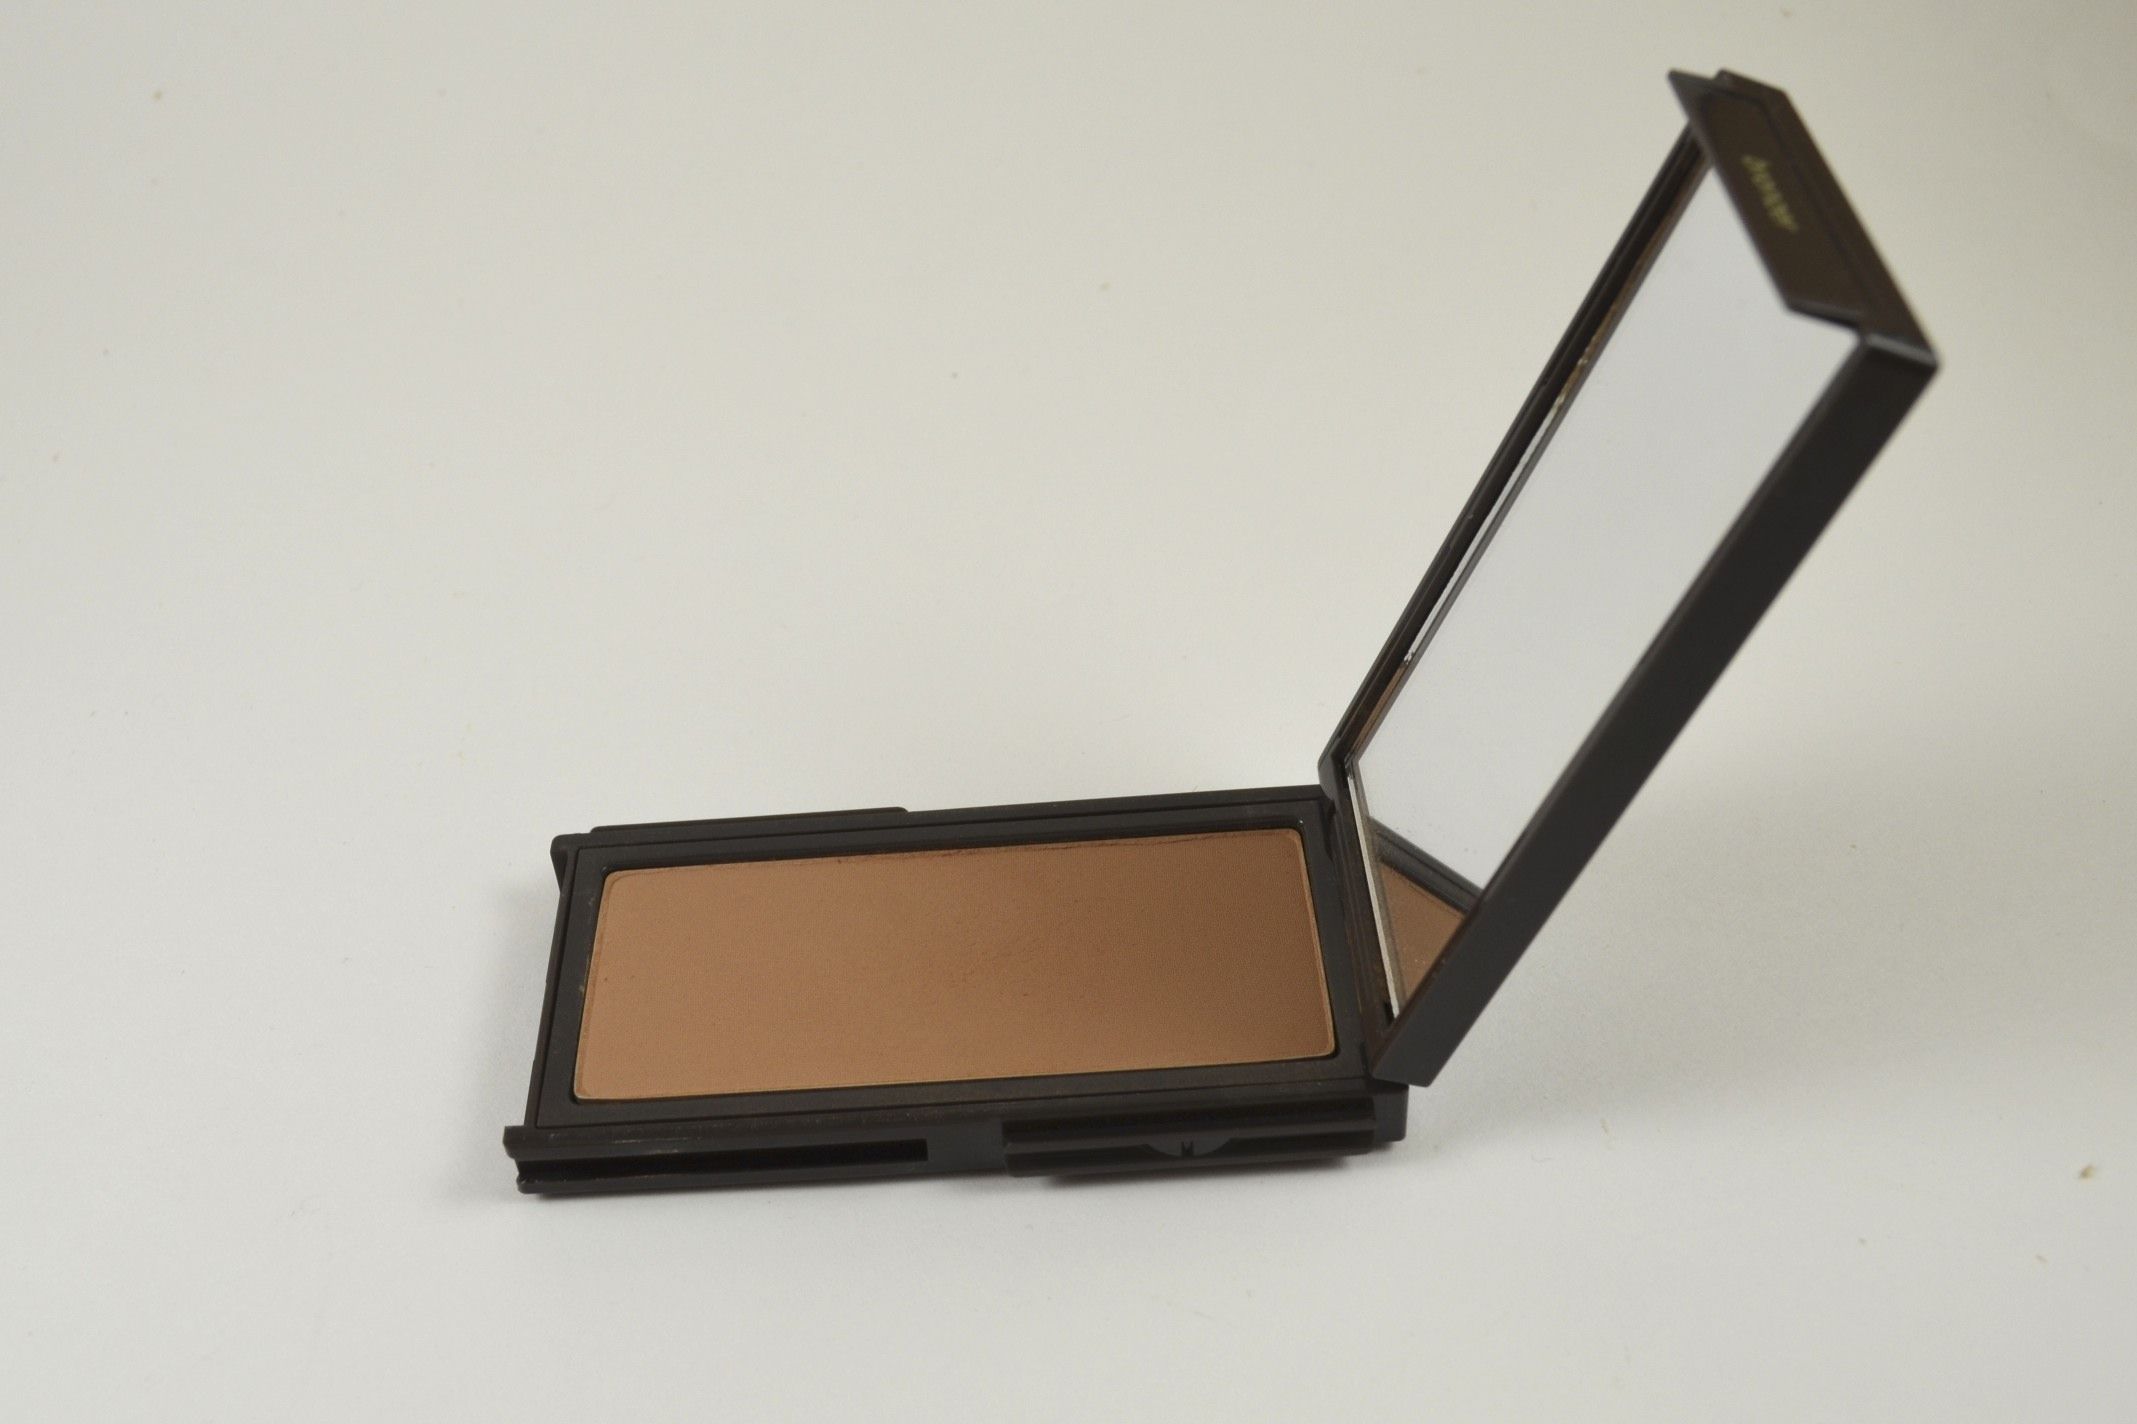 jouer cosmetics mineral powder bronzer in suntan review